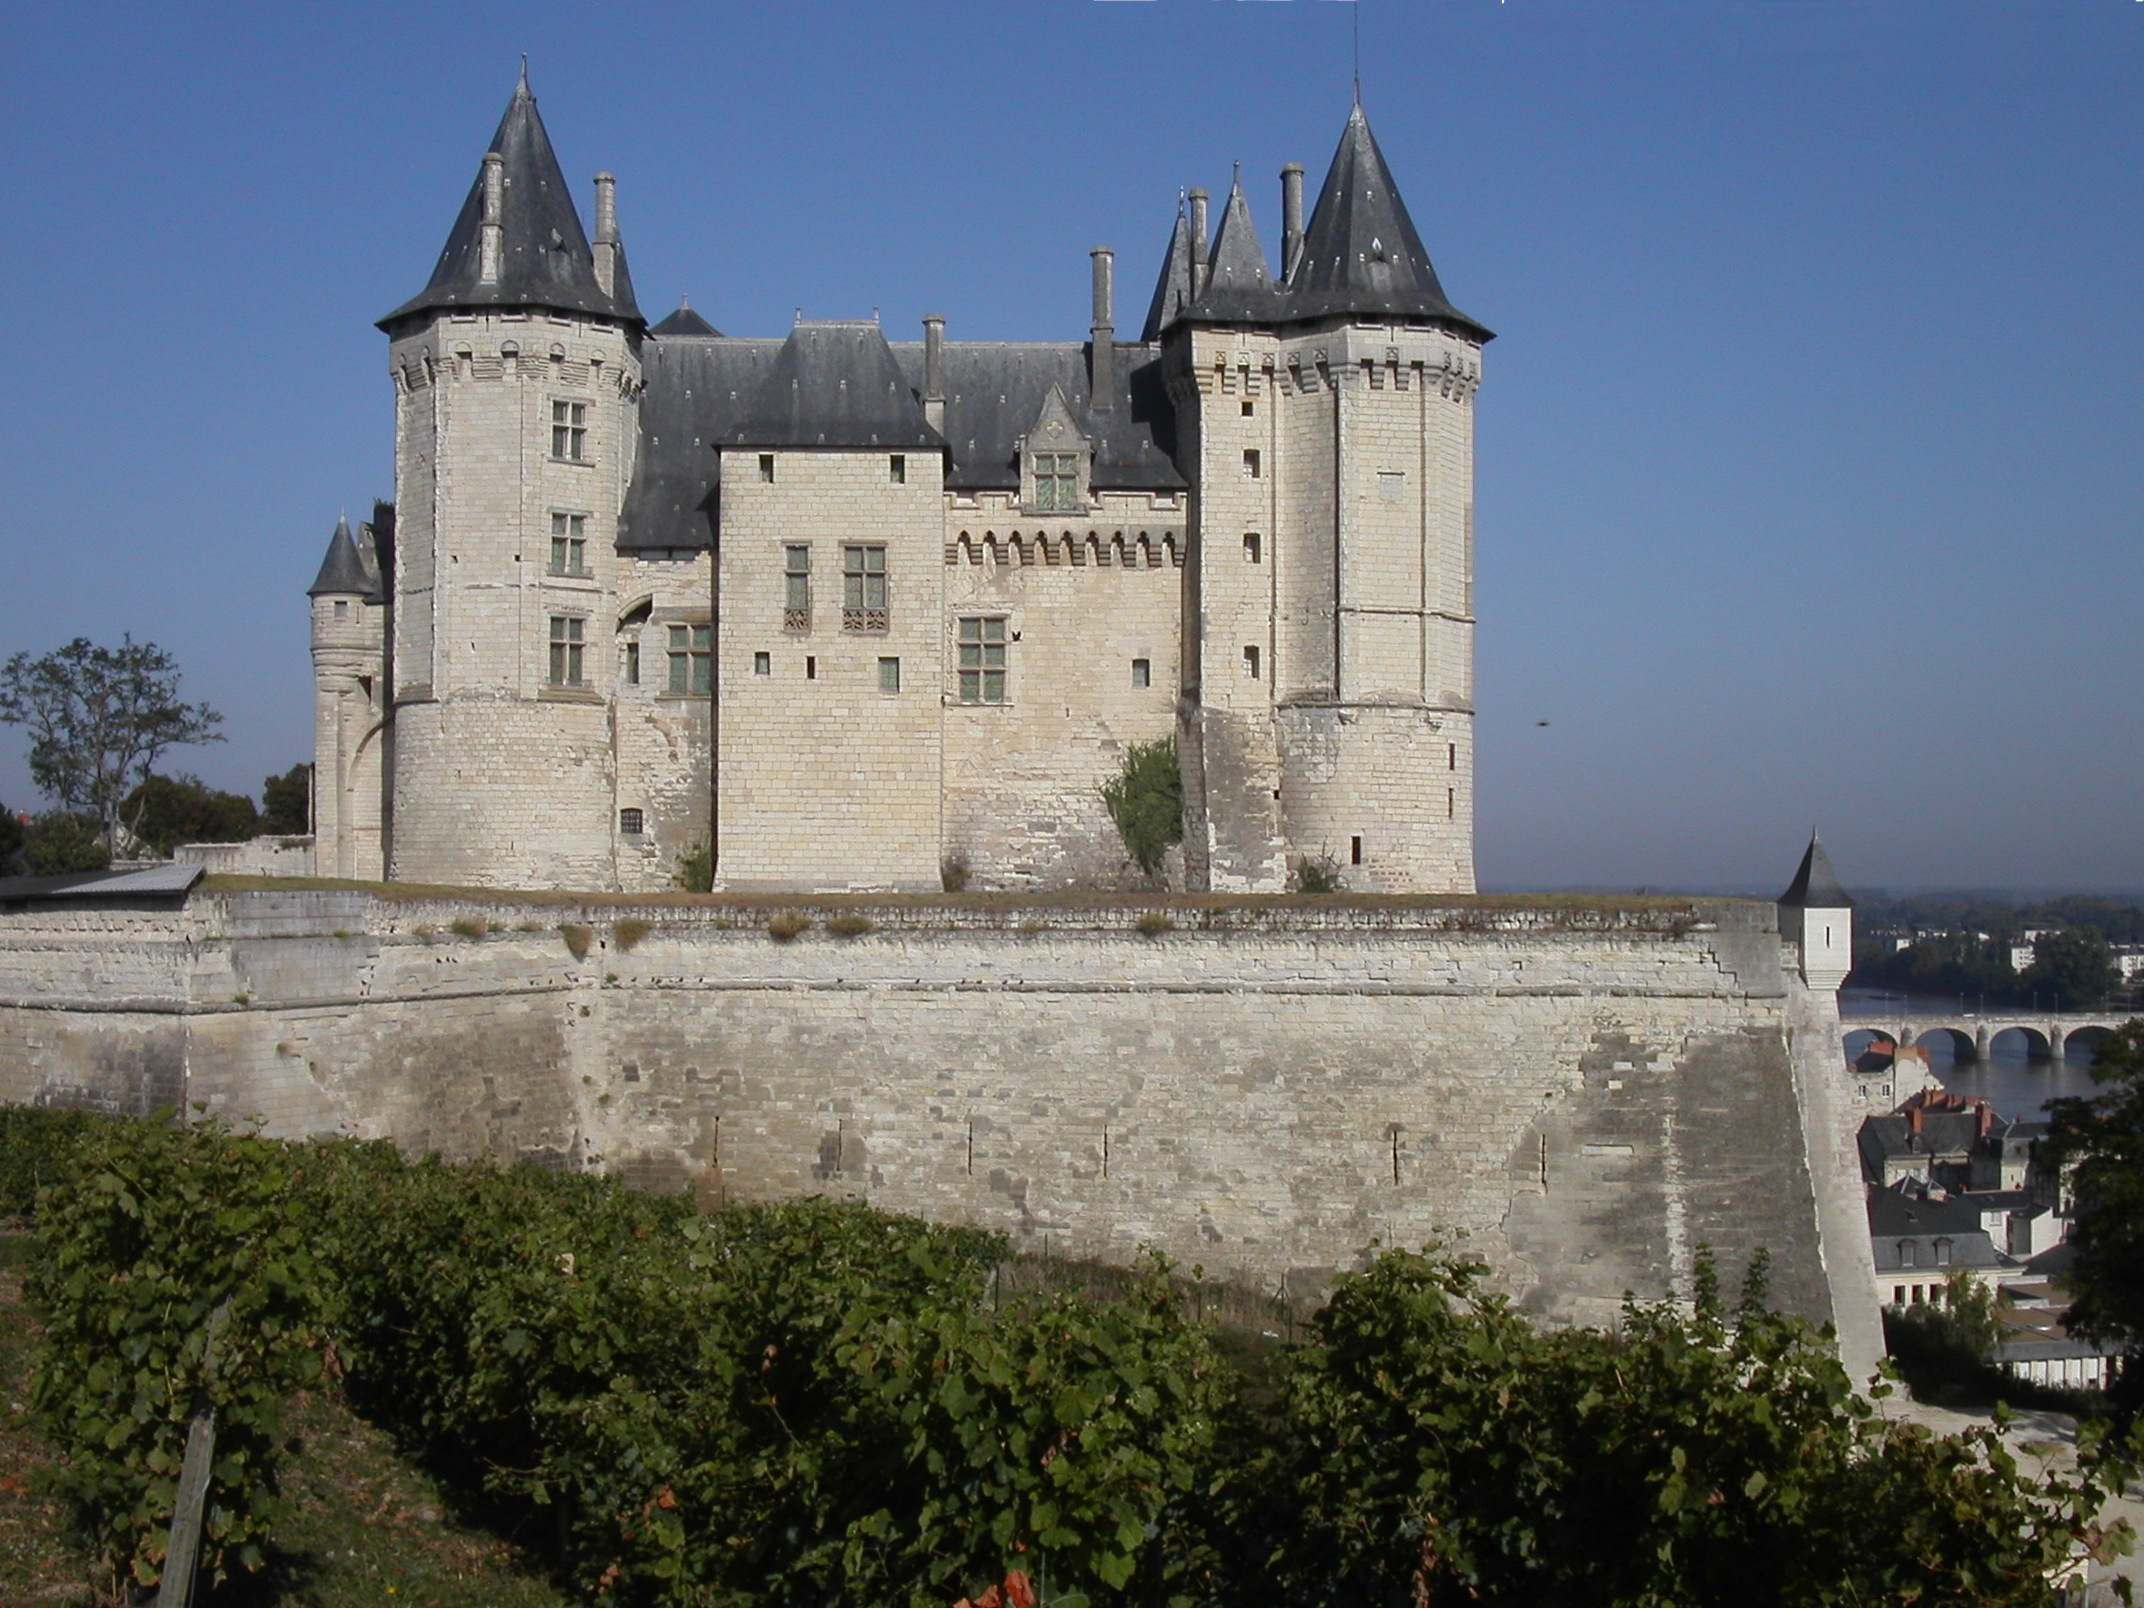 https://upload.wikimedia.org/wikipedia/commons/a/a6/Chateau_de_saumur.jpg